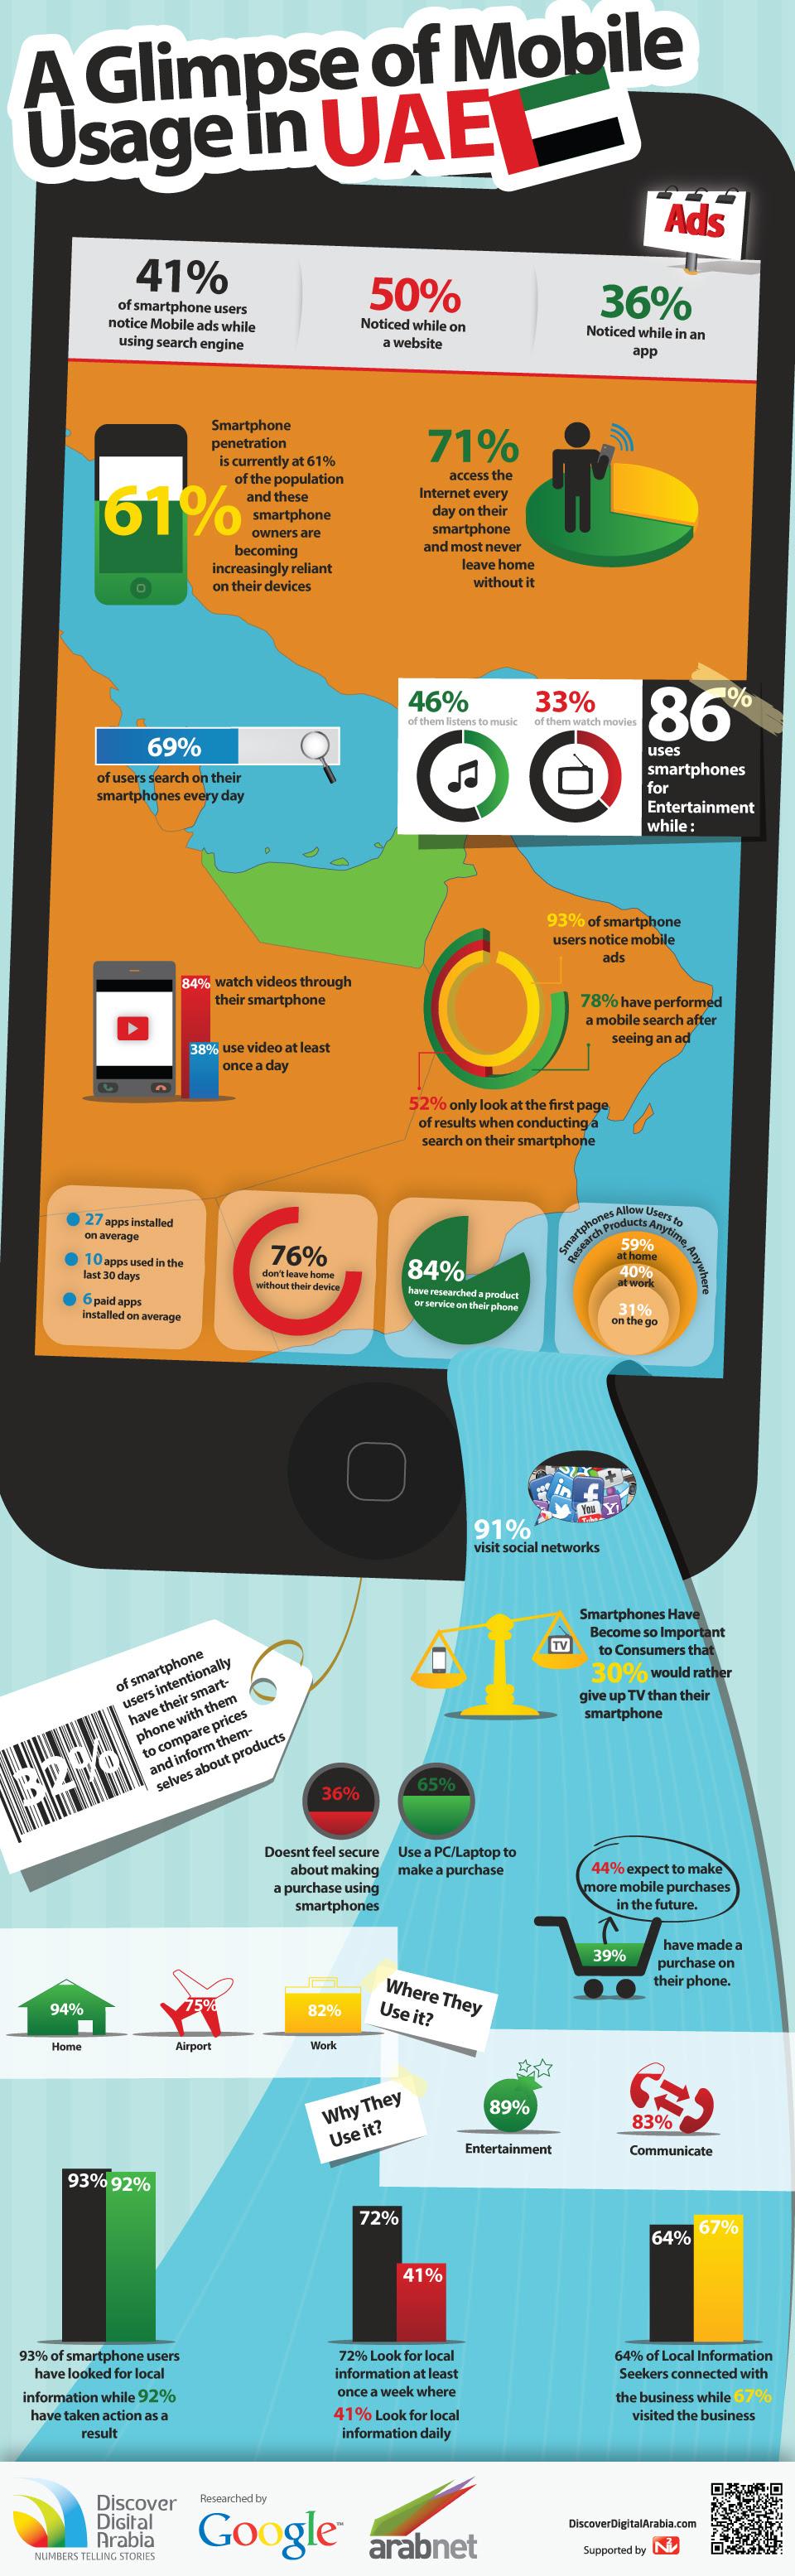 MobileUAE انفوجرافيك: انتشار الهواتف الذكية في الامارات والسعودية [احصائيات]